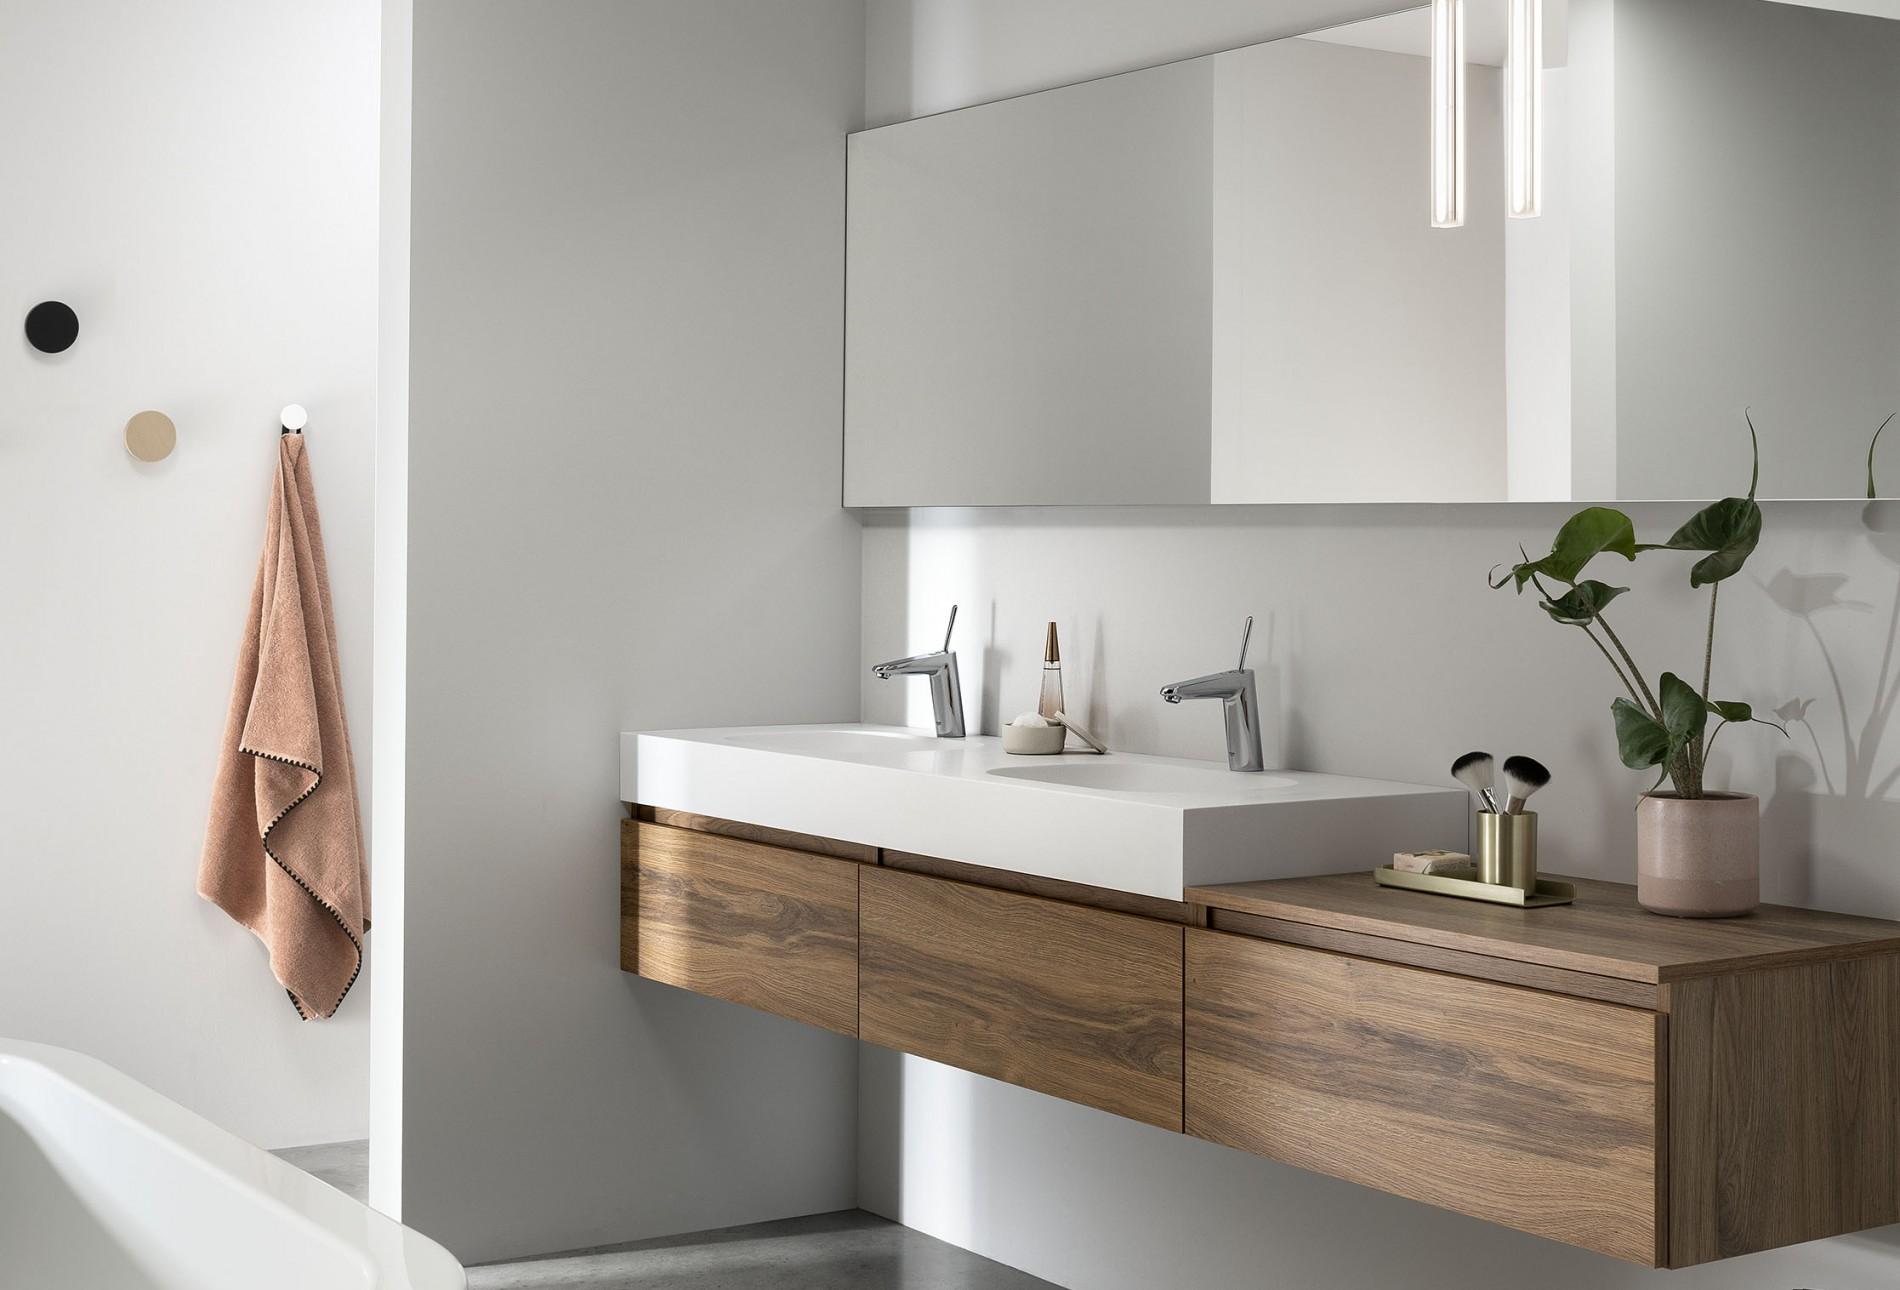 Afmeting Badkamer Spiegel : Afmetingen spiegelkast badkamer sanijura sobro 120 cm incl spiegel